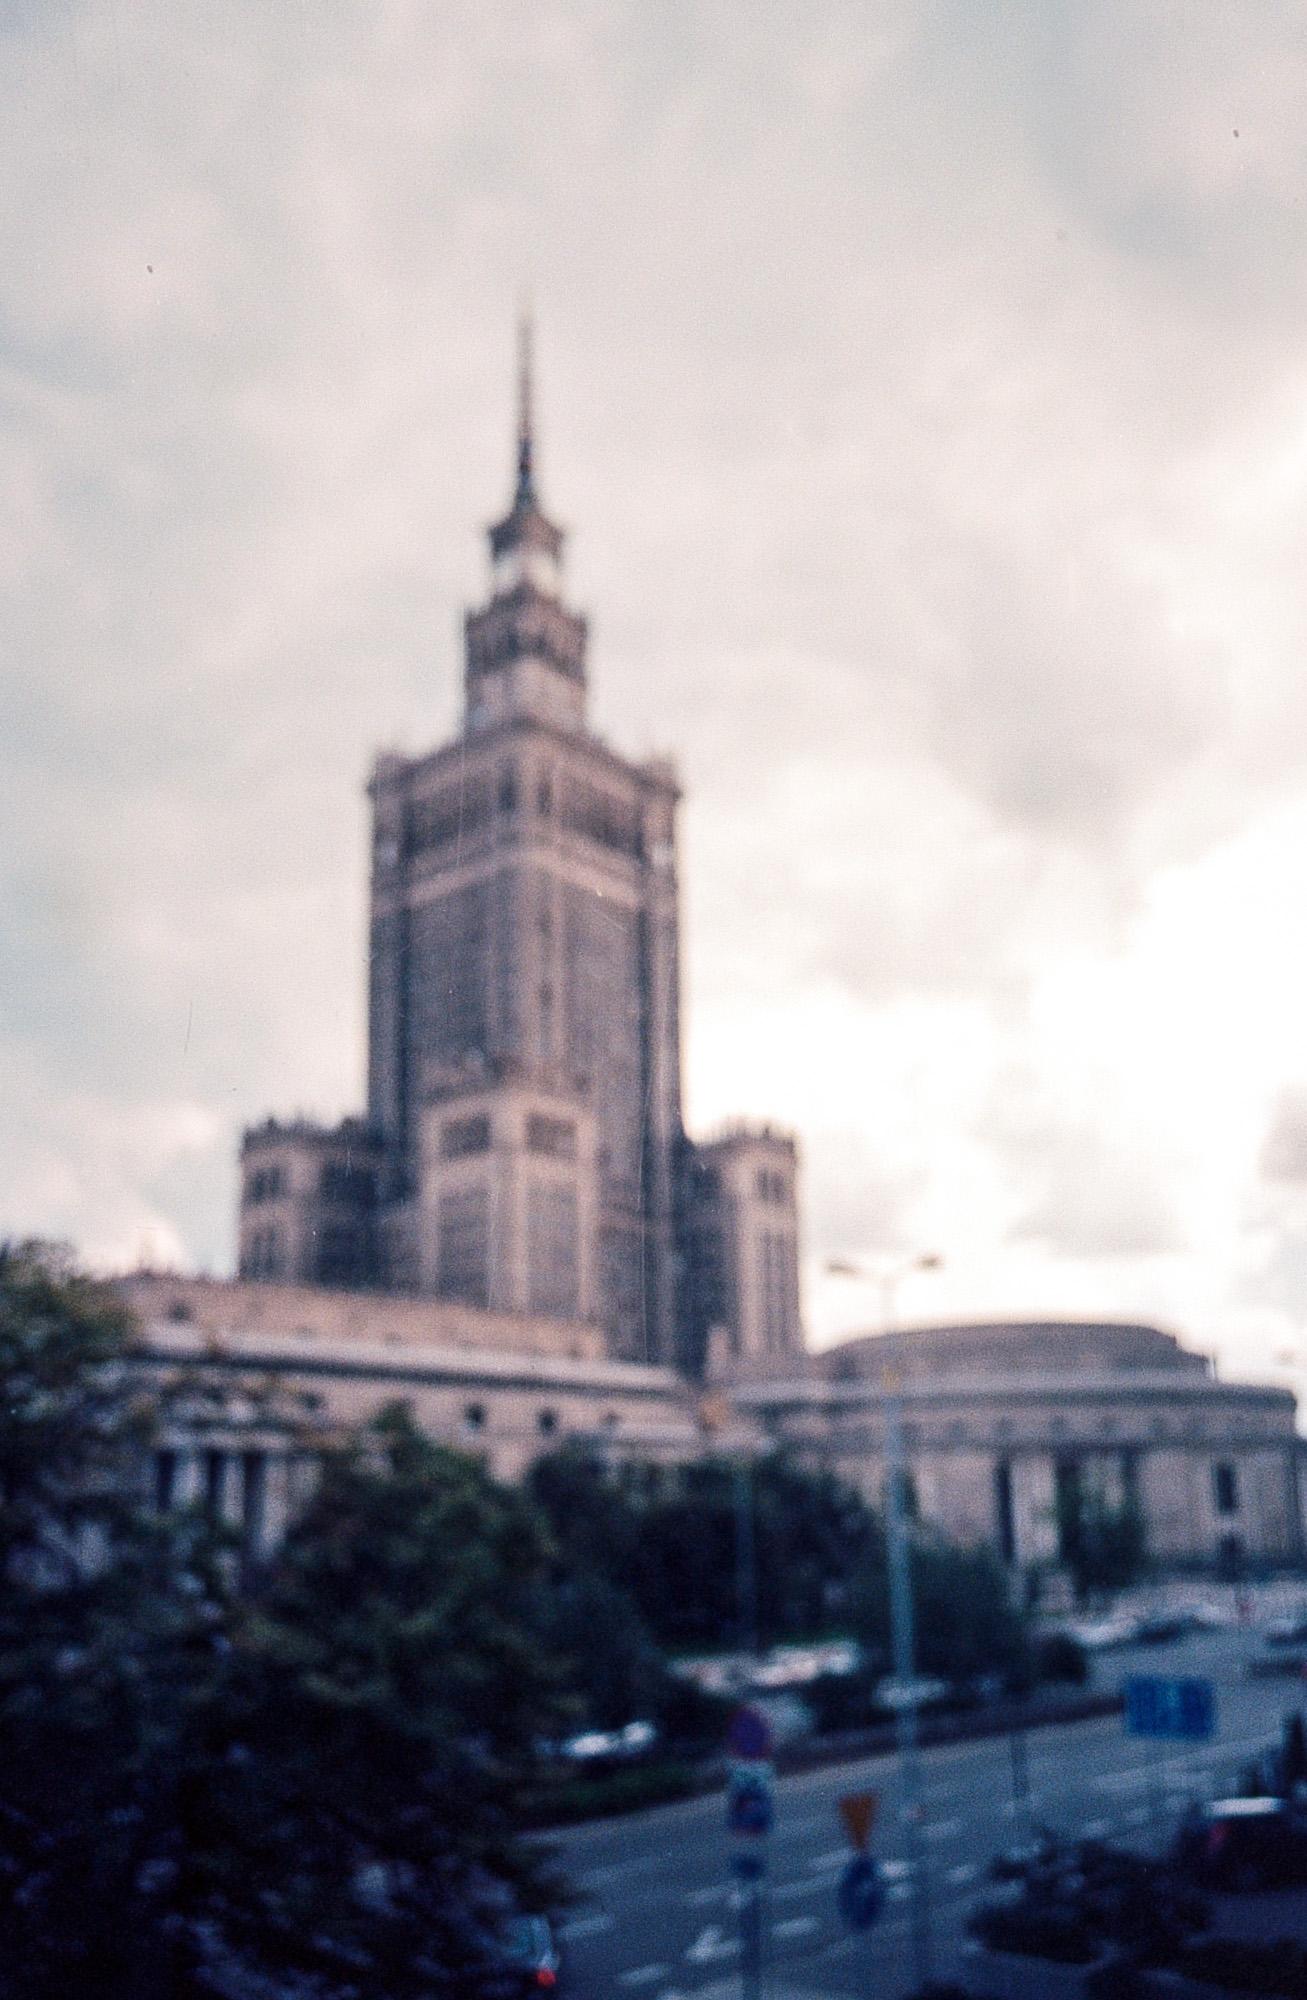 Warsaw,Poland (2013)